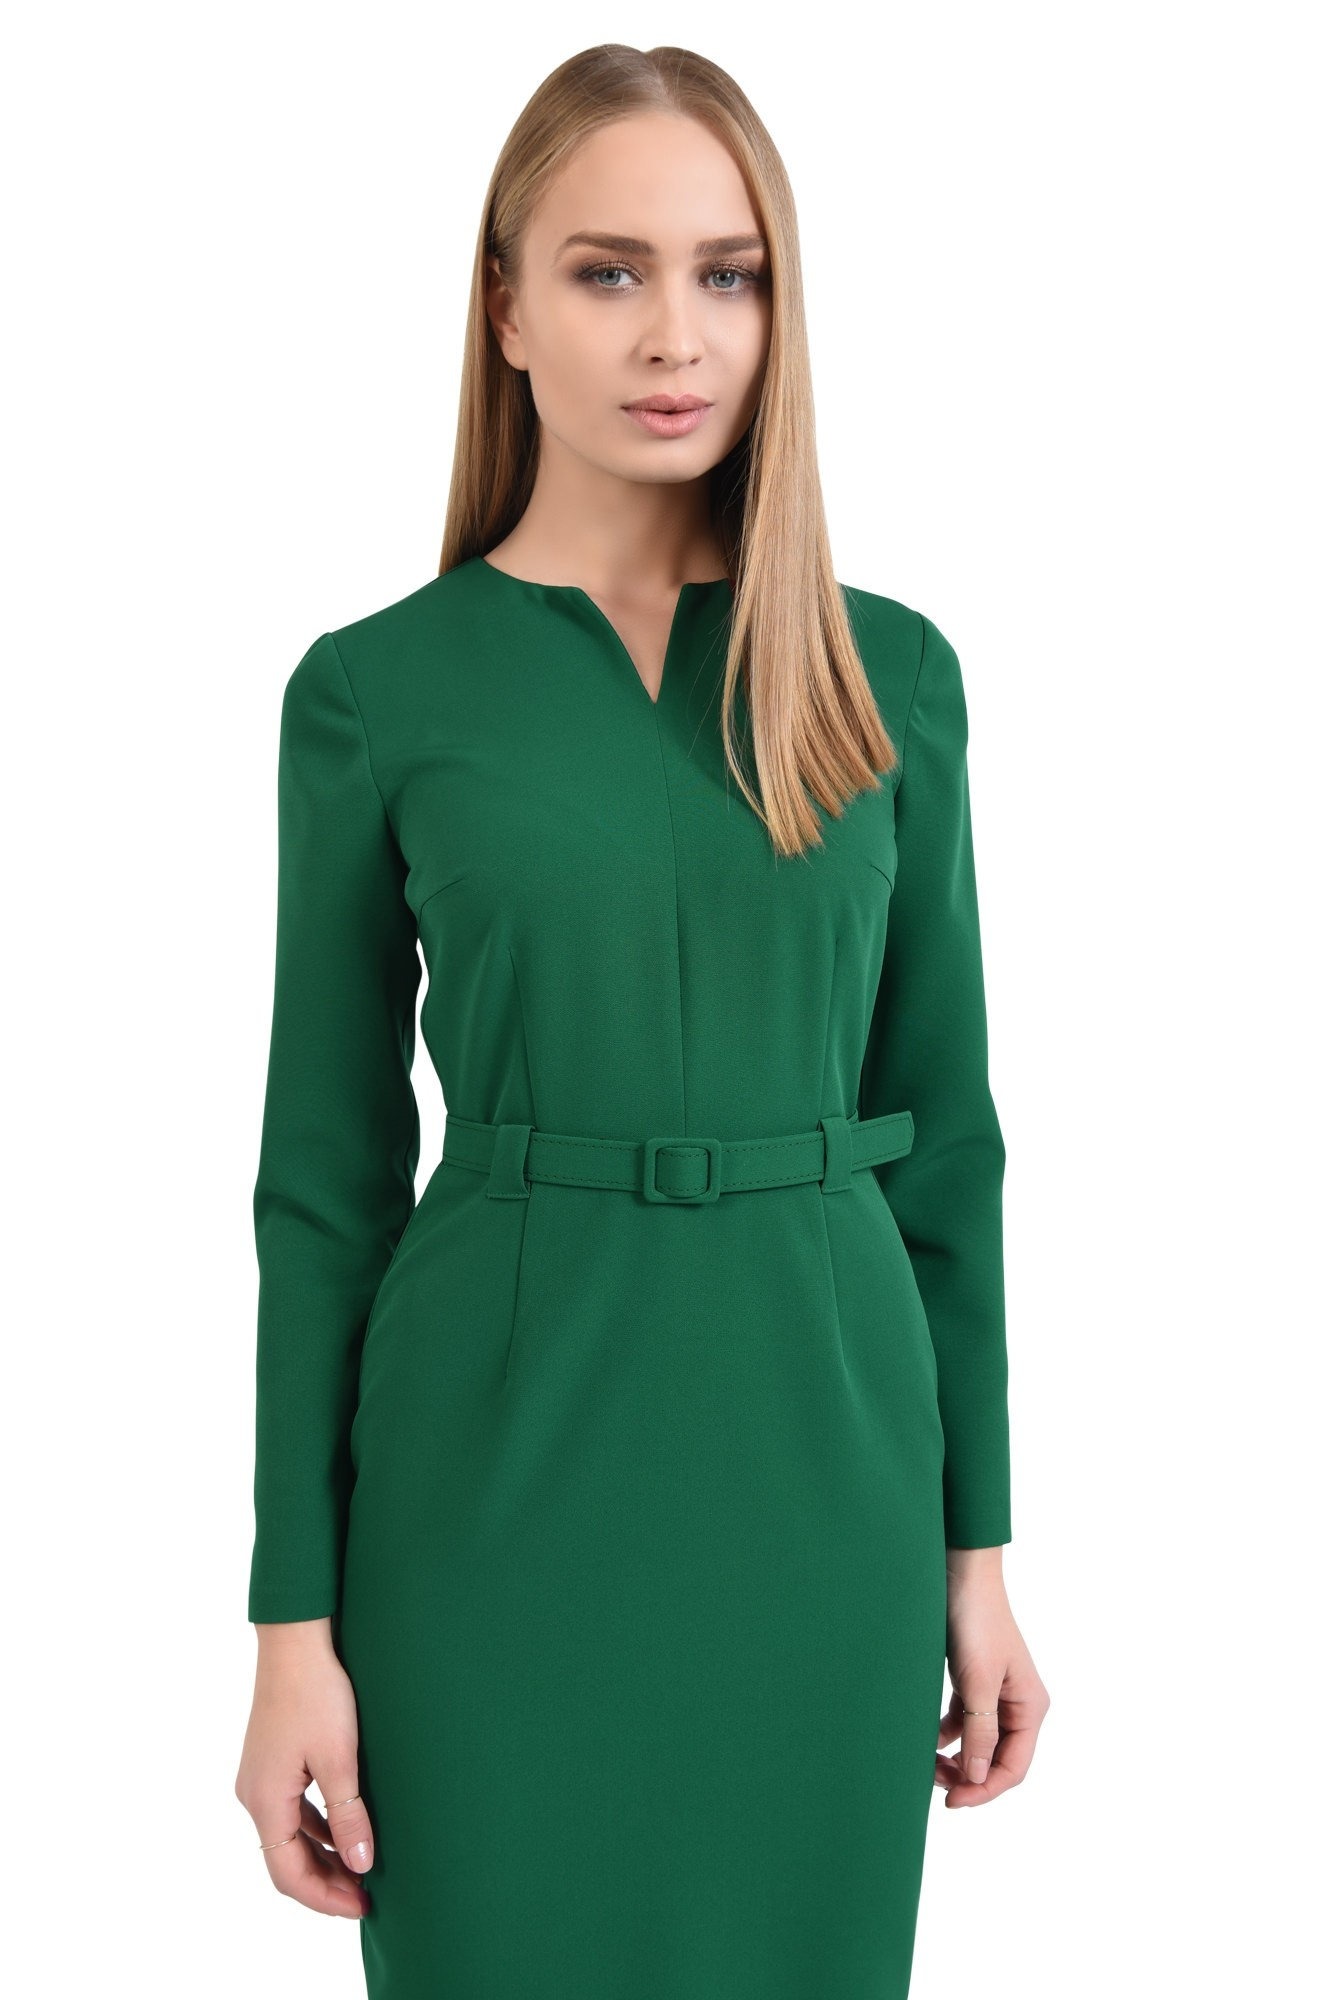 rochie casual, midi, maneci lungi, centura ingusta, verde